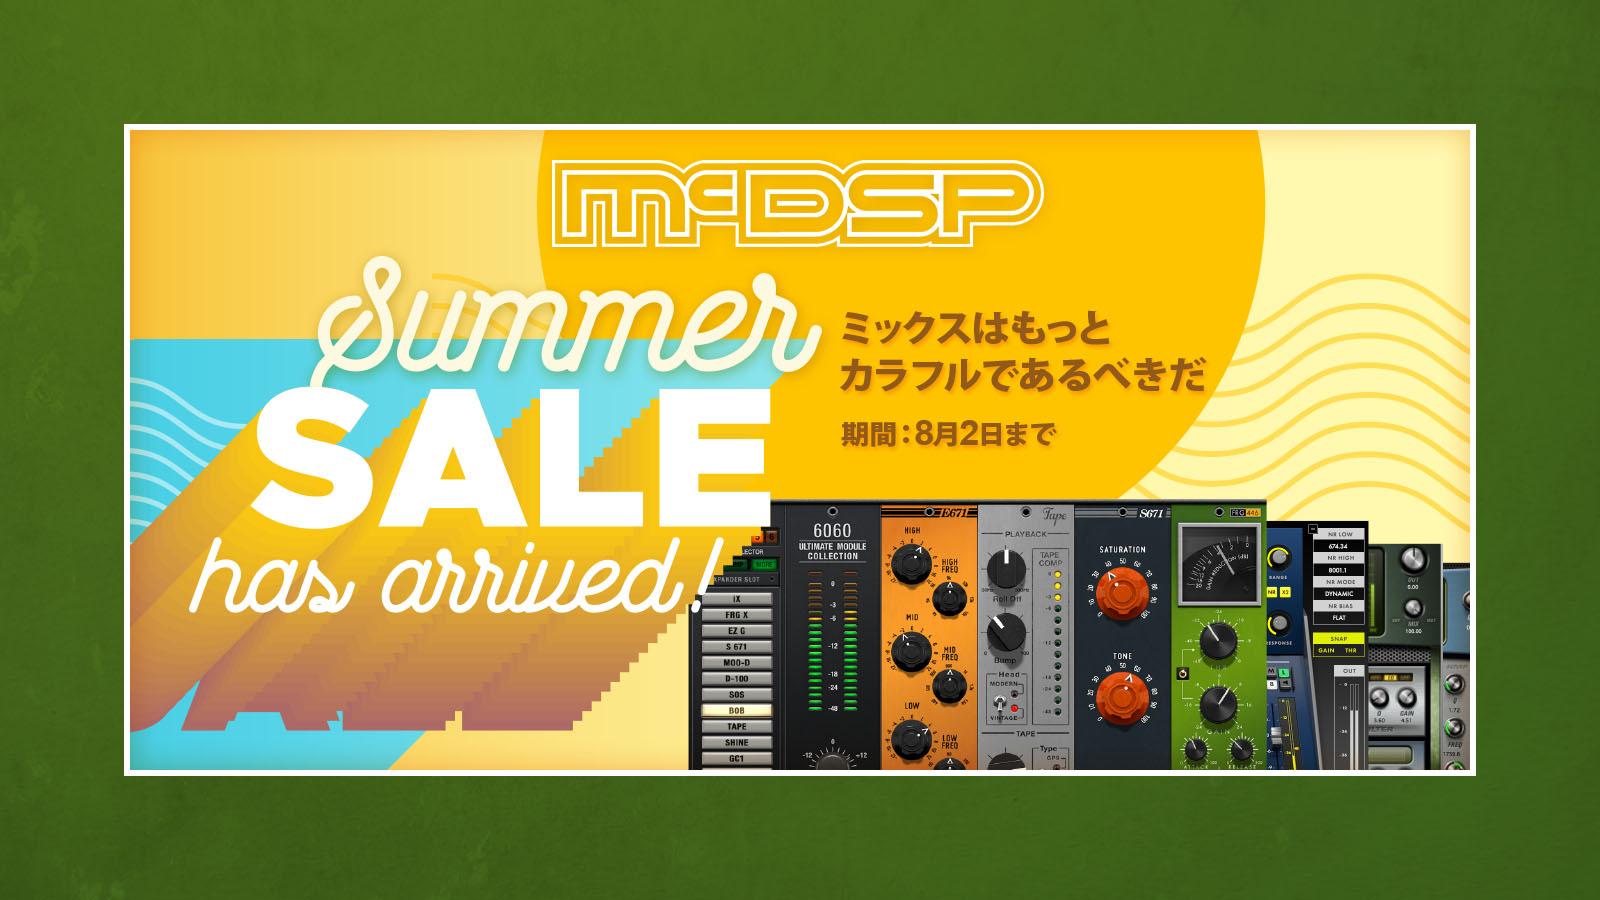 McDSP Summer Saleプロモーション